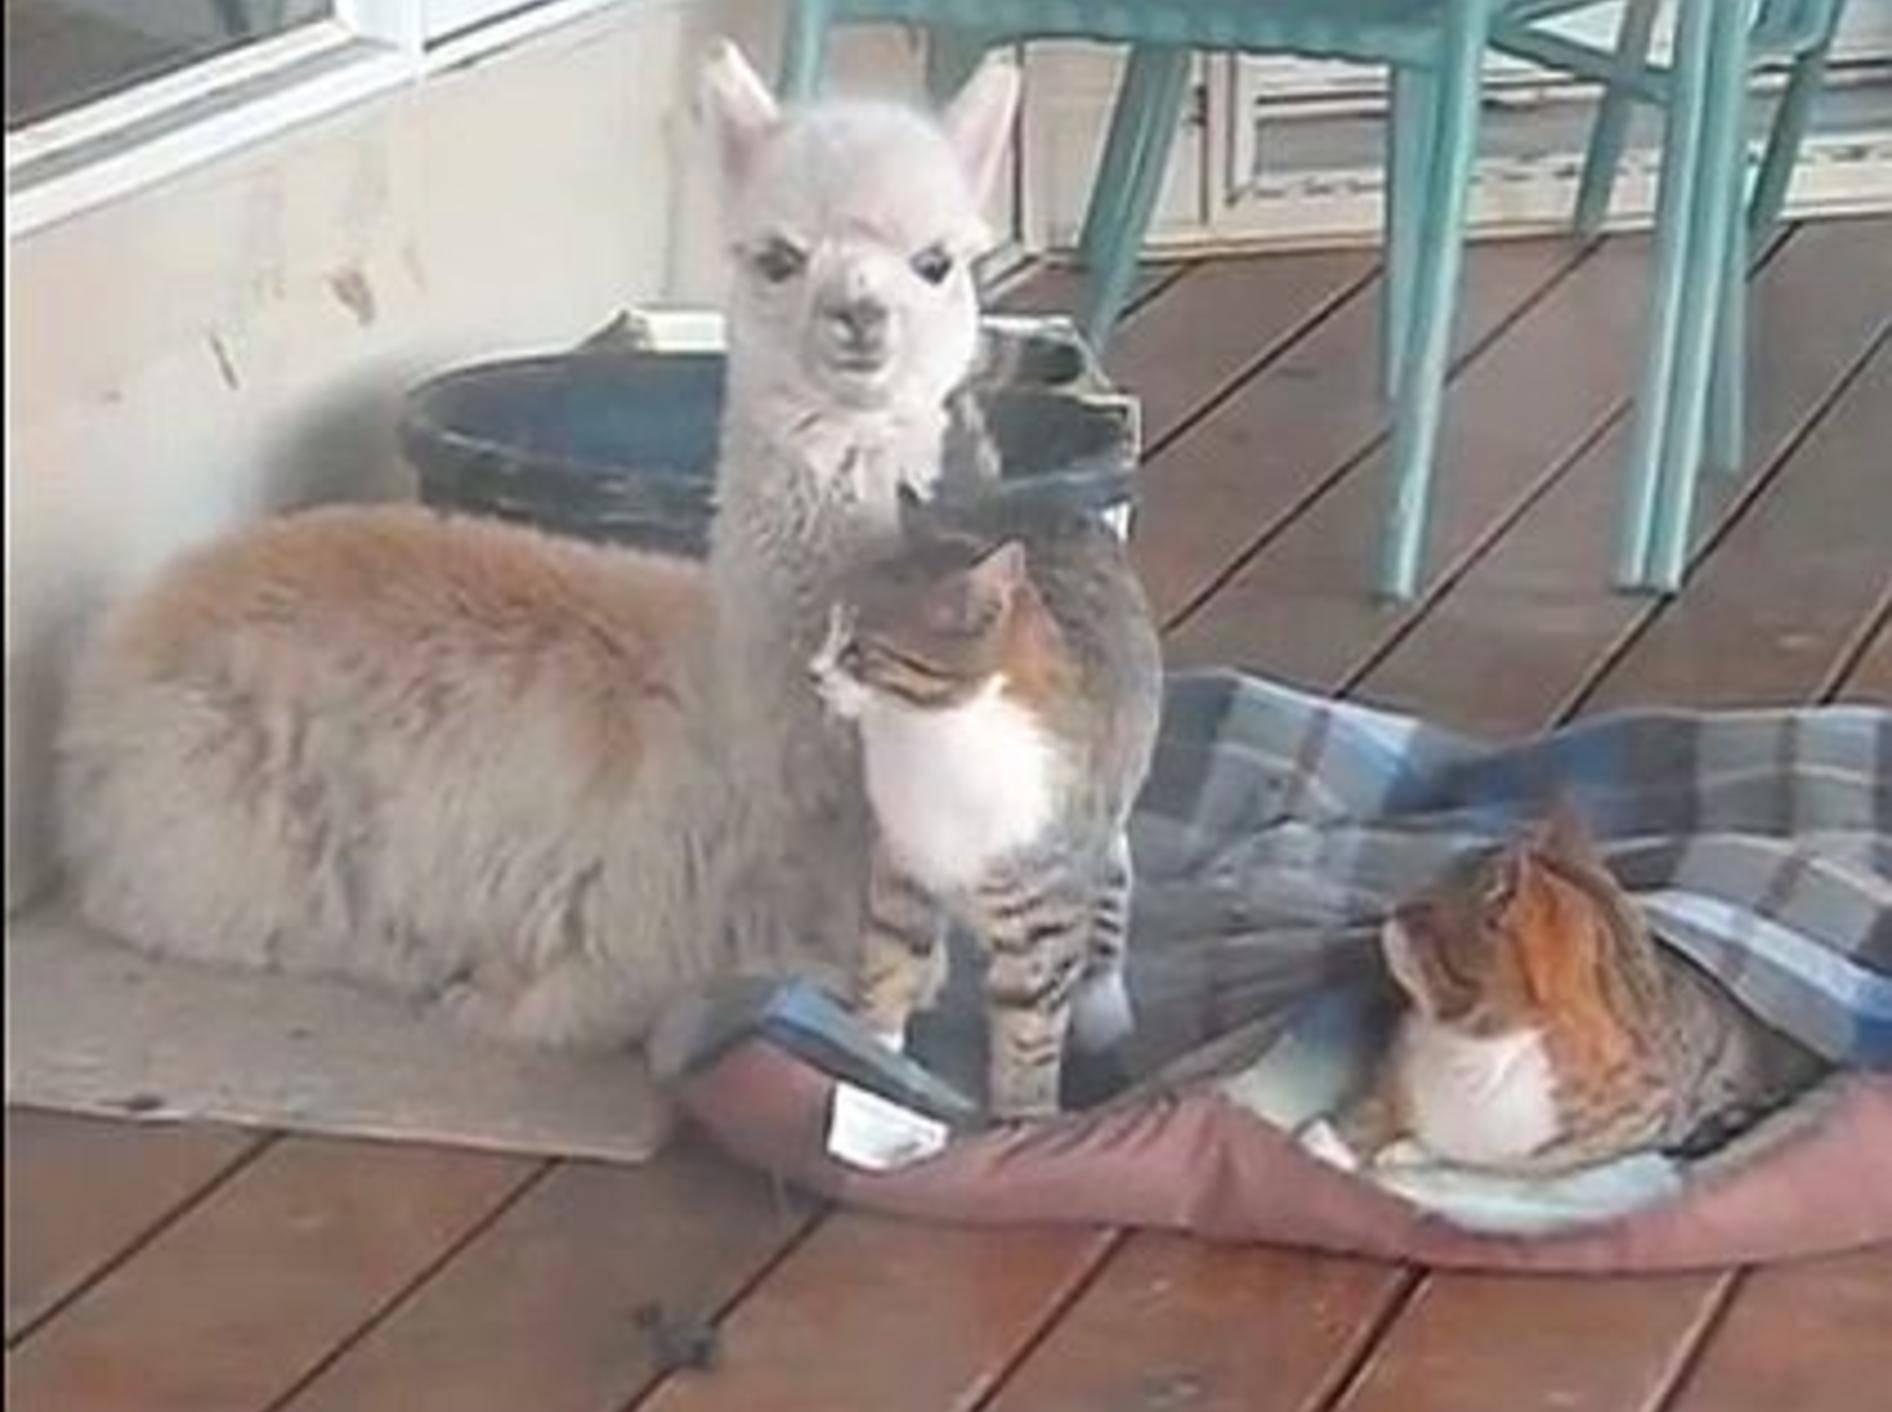 Flauschige Freunde: Alpaka und zwei Katzen – Bild: Youtube / A to Z Alpacas